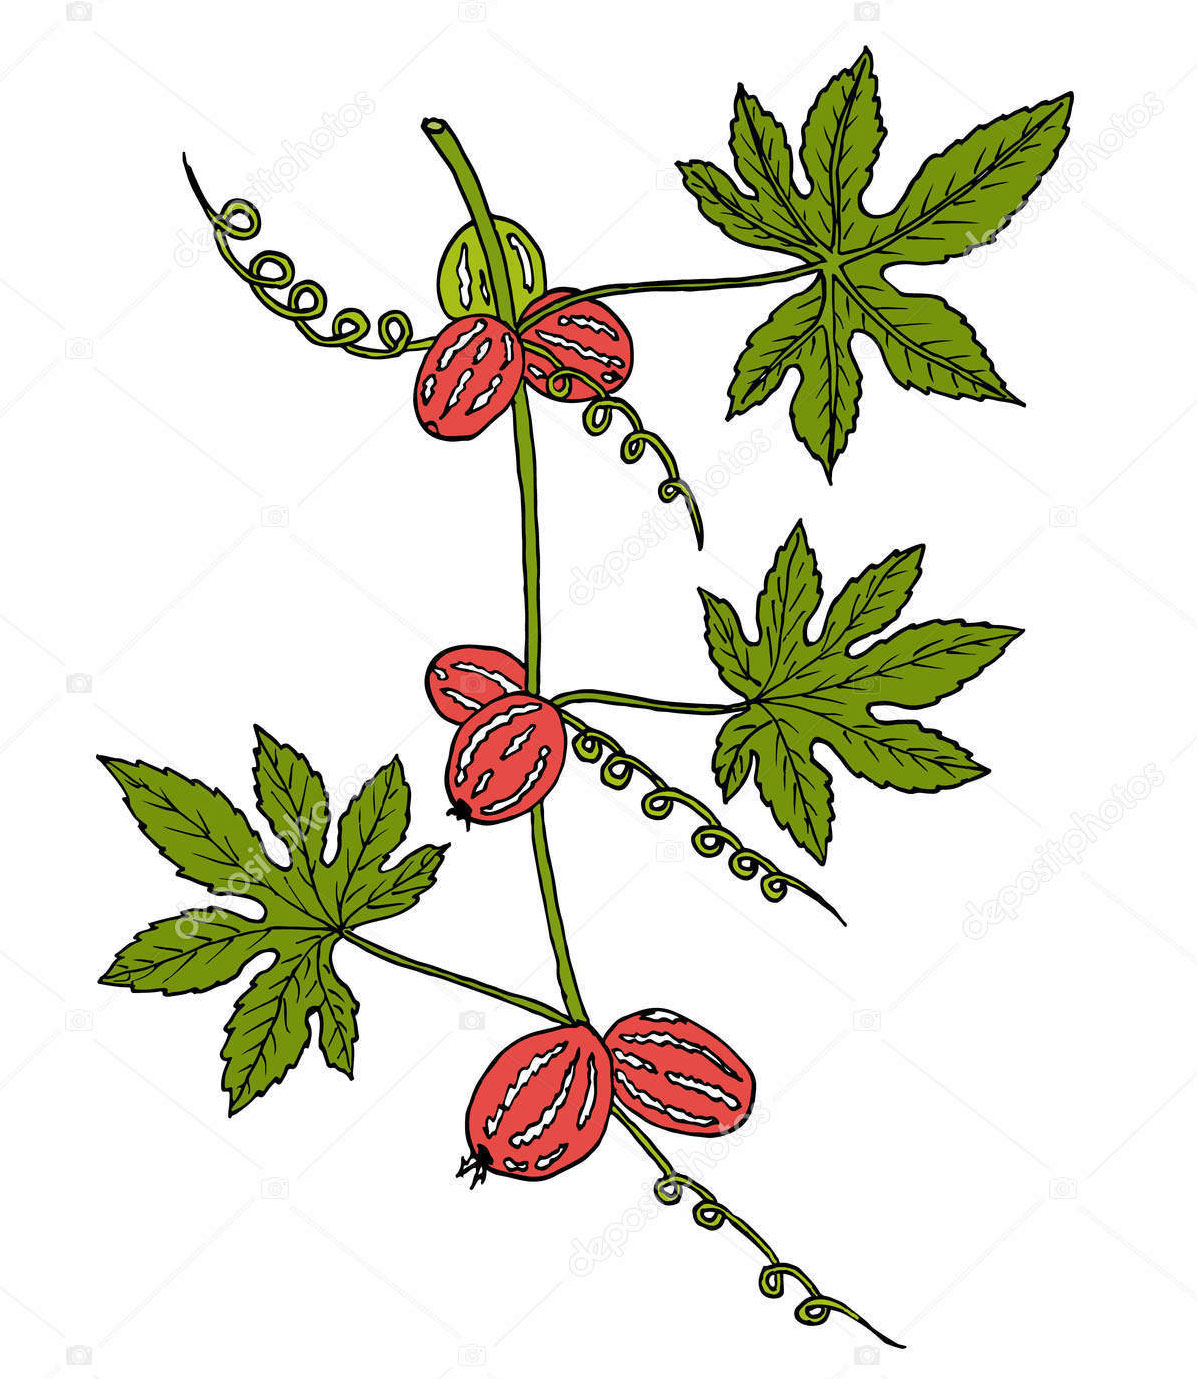 Plant-Illustration-of-Lollipop-climber-plant